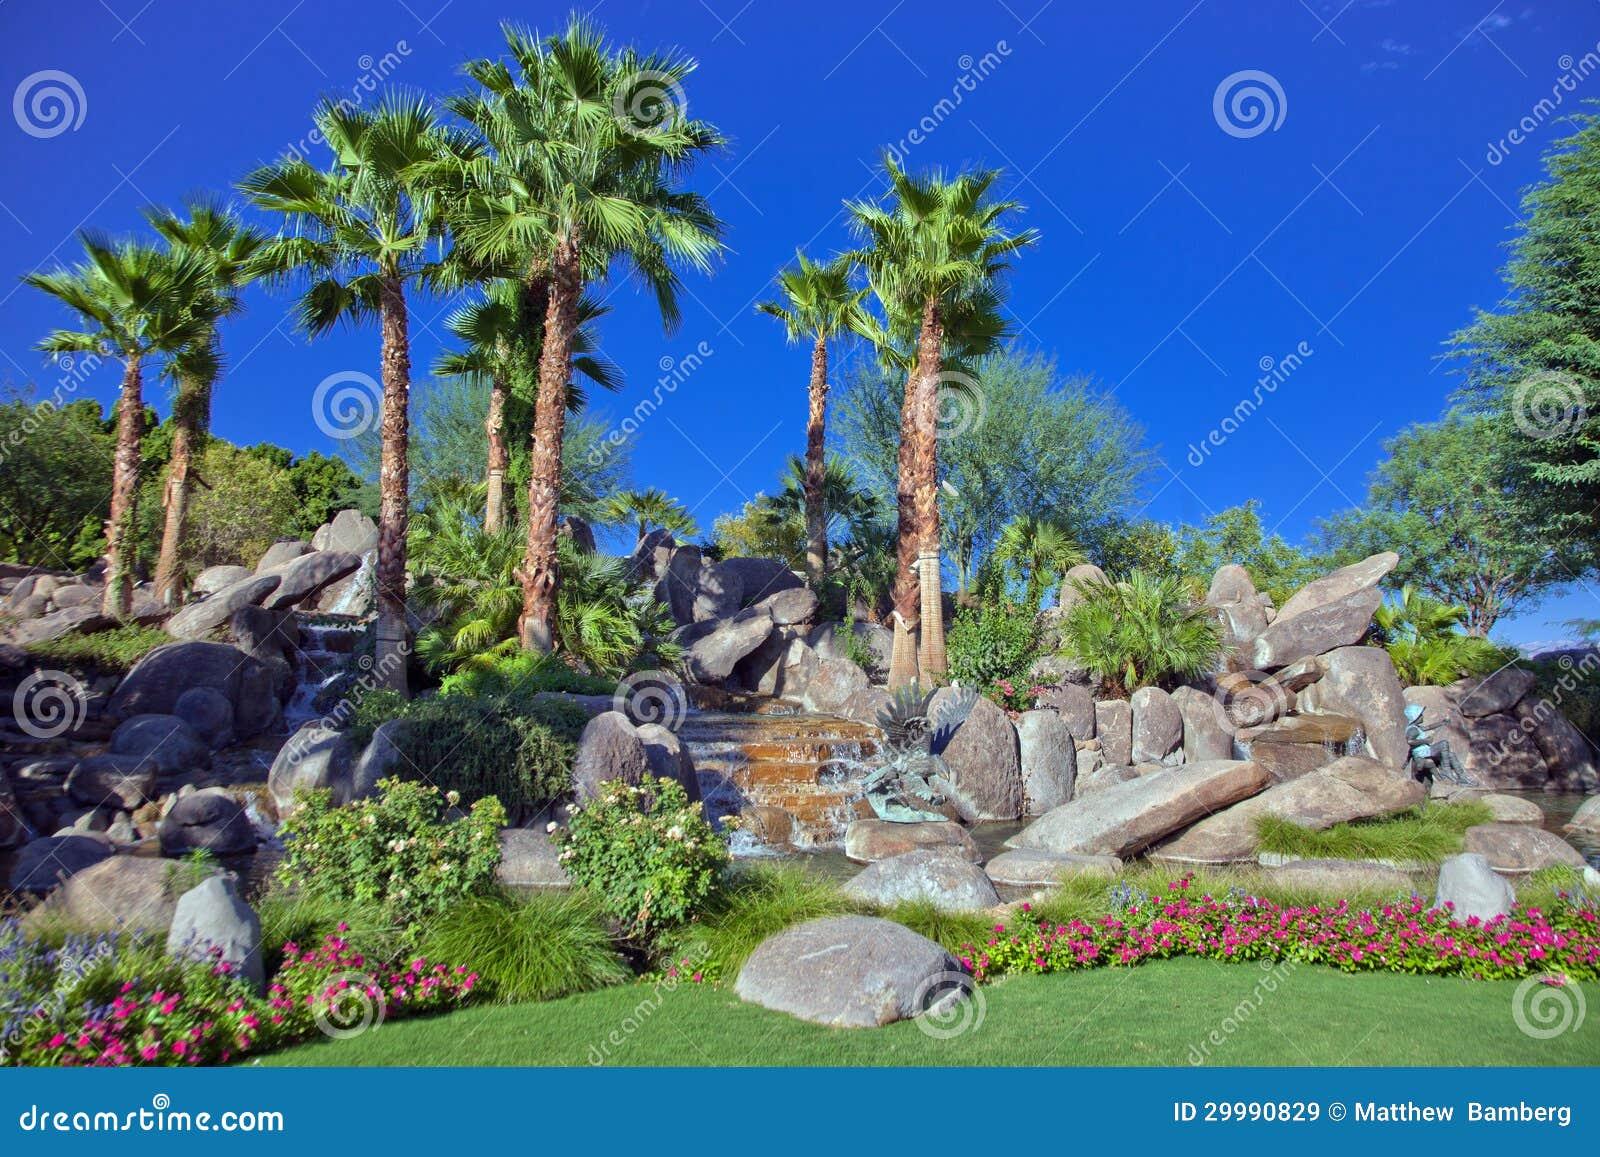 Desert Garden Palm Springs stock image. Image of oasis - 29990829